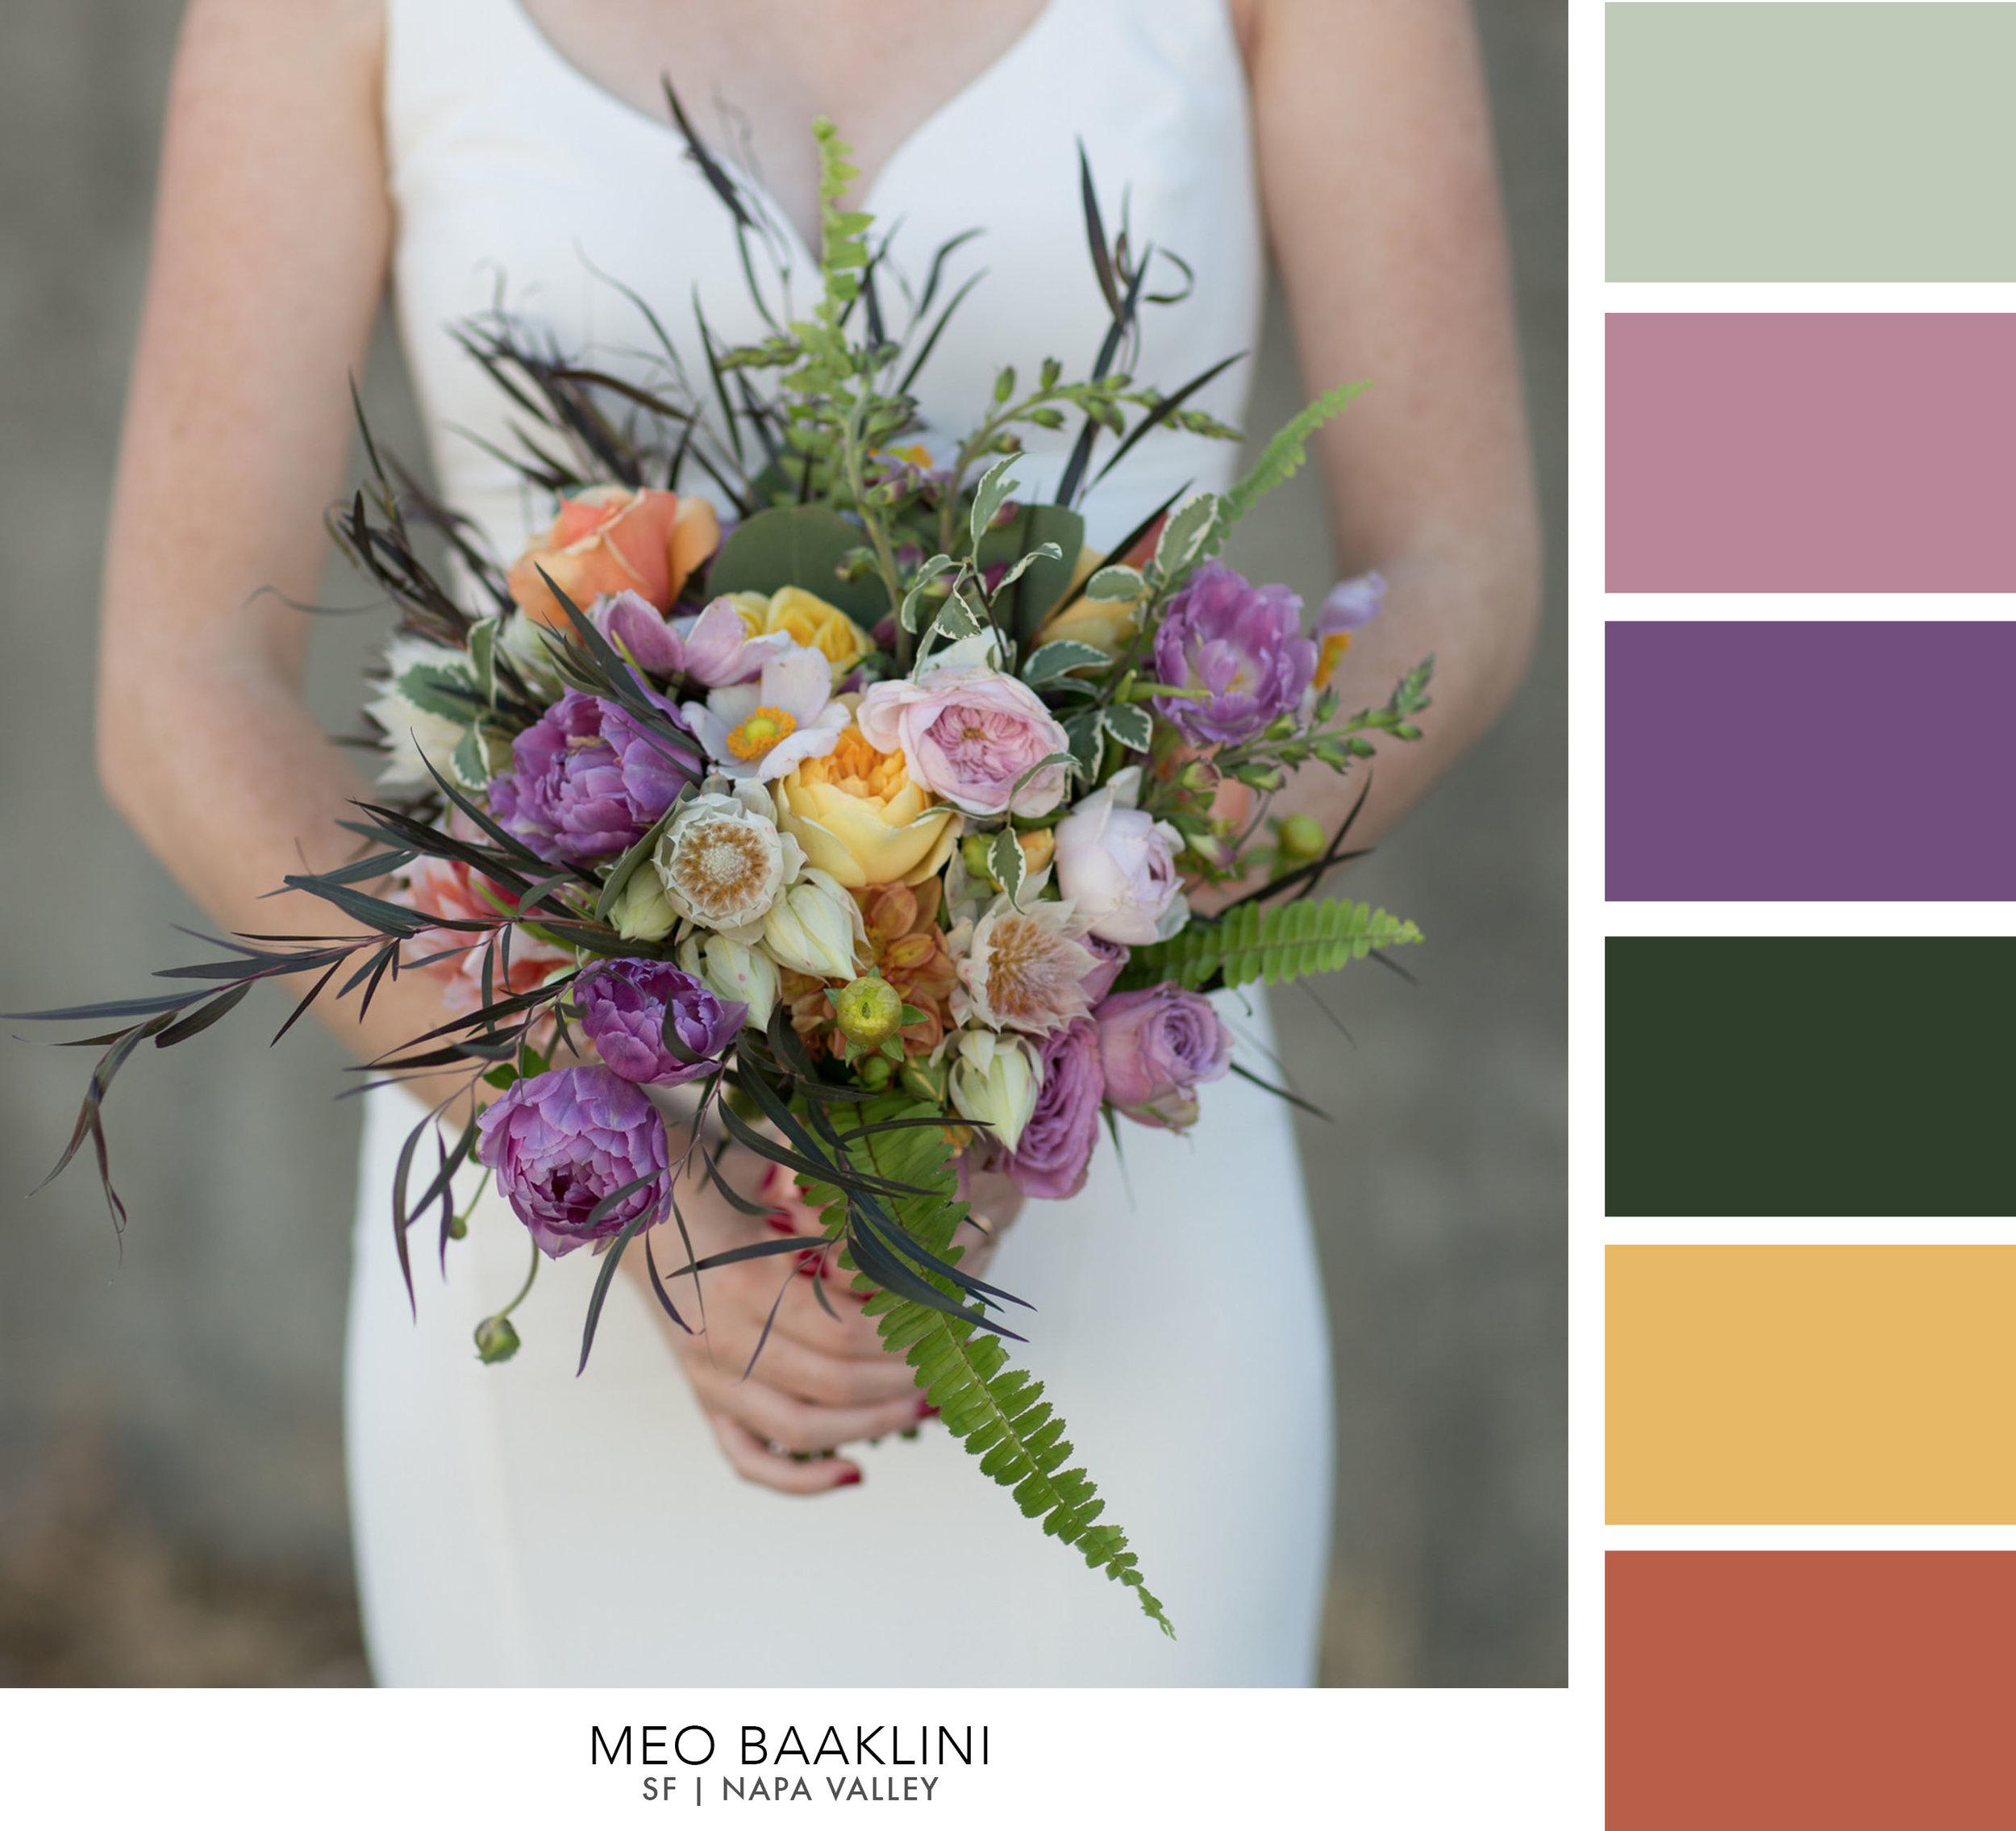 AWedding_Bouquet_Color_Palette_Inspiration_201605.jpg